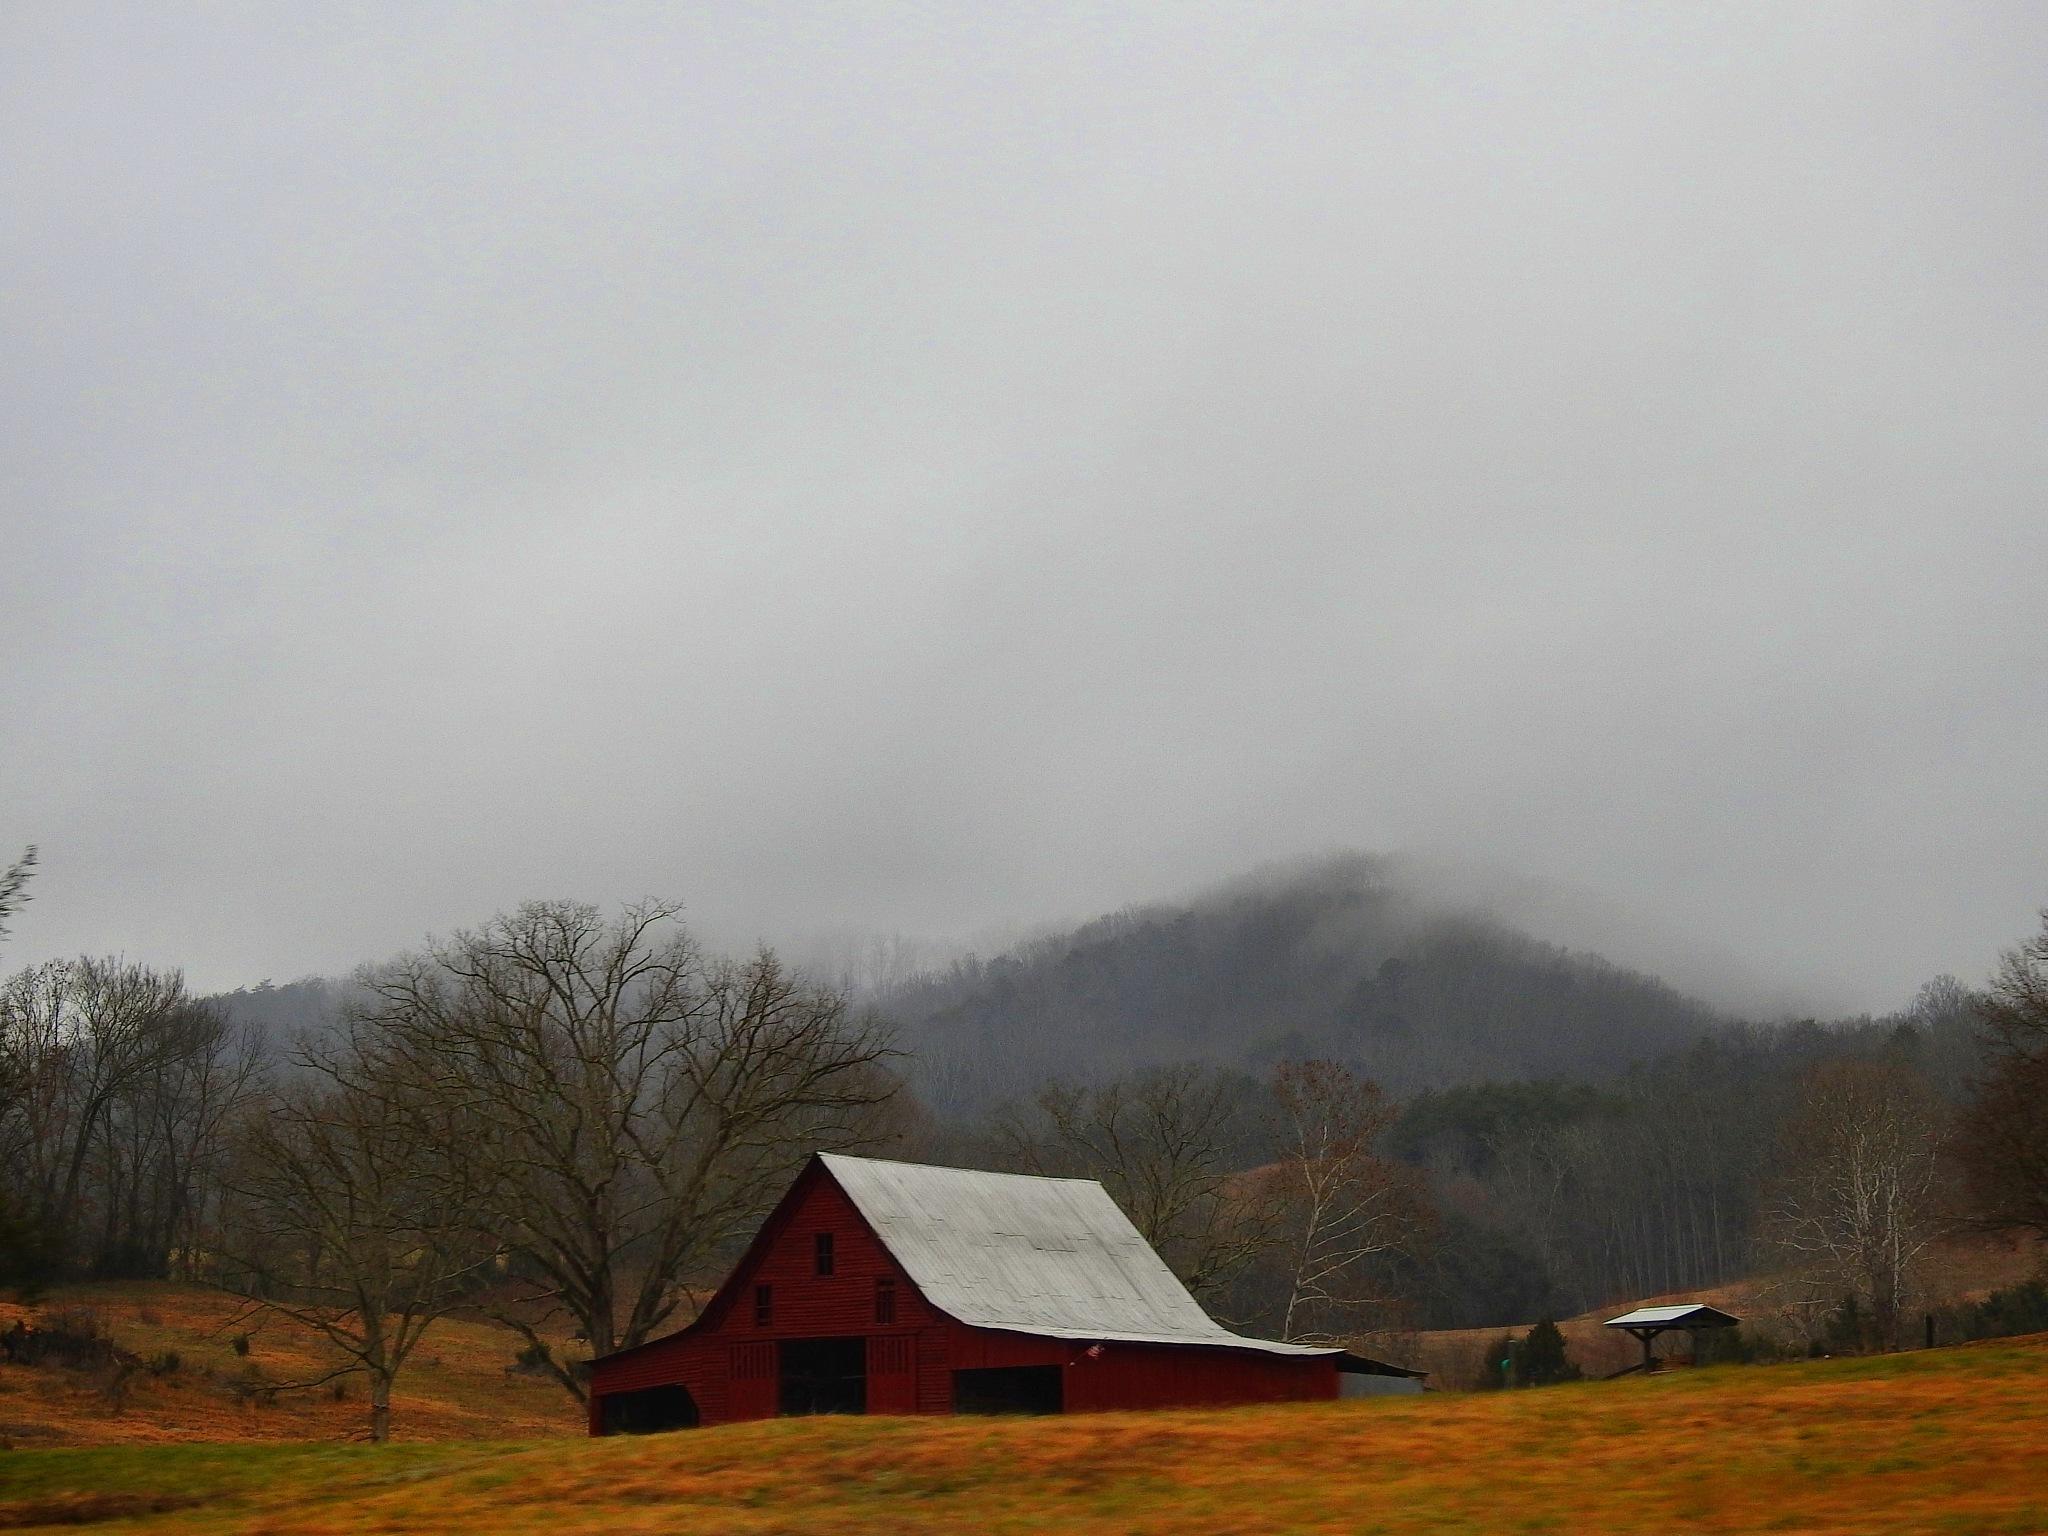 Foggy Barn by Patty Stockton